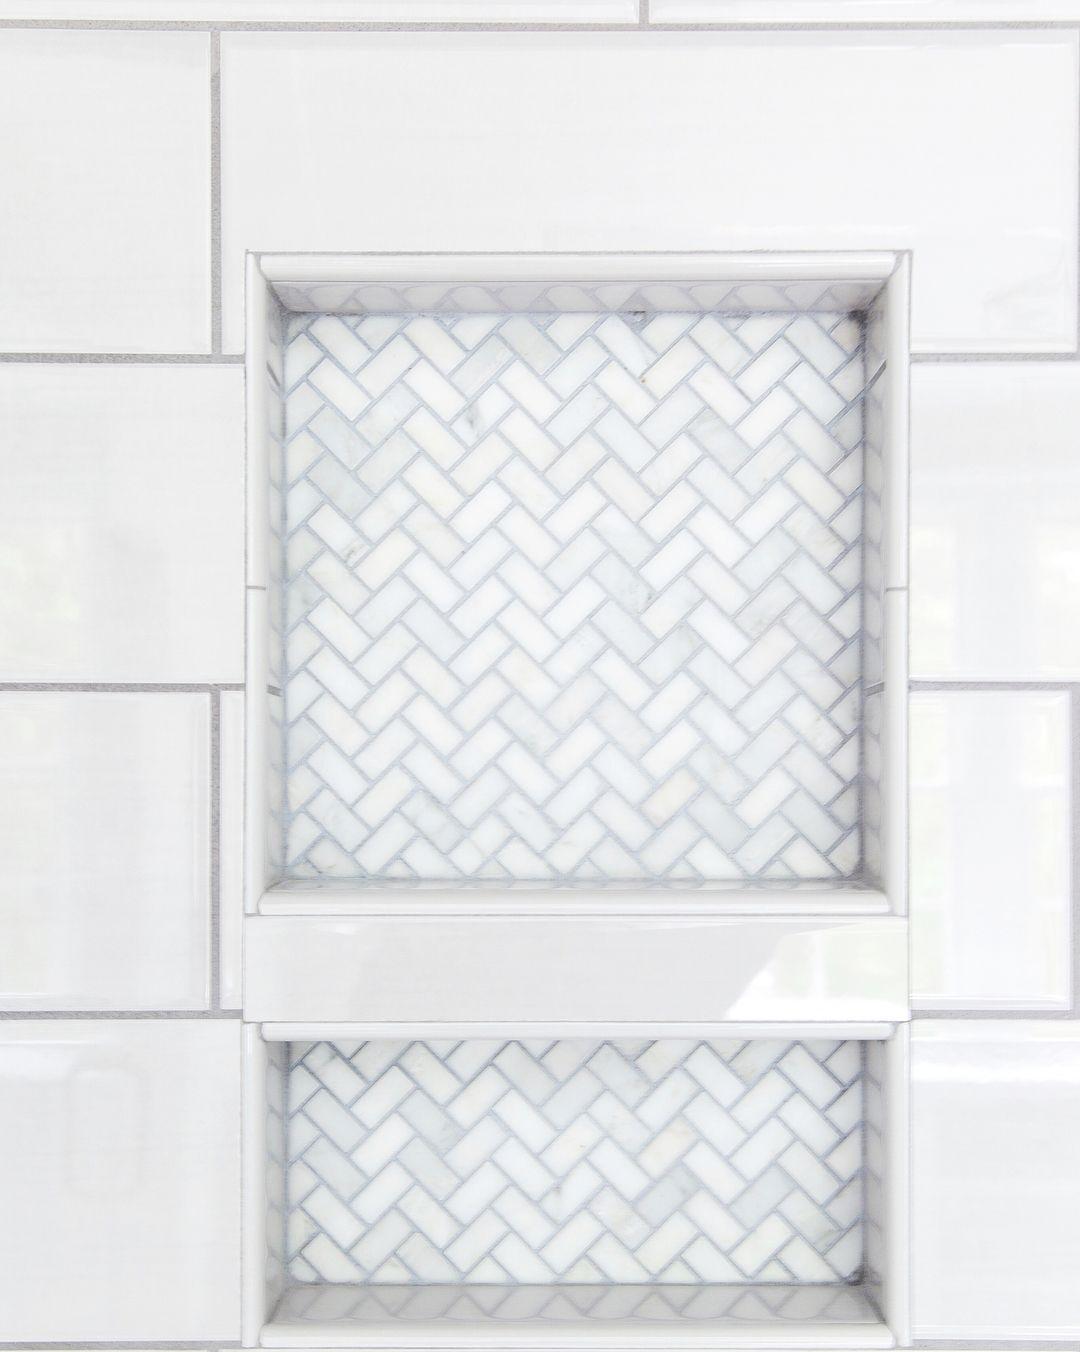 Kate H Design Marble Chevron Tile Detail In Shower Niche Oversized Gray Subway Tile Walls Tile Shower Niche Shower Niche Shower Tile Designs